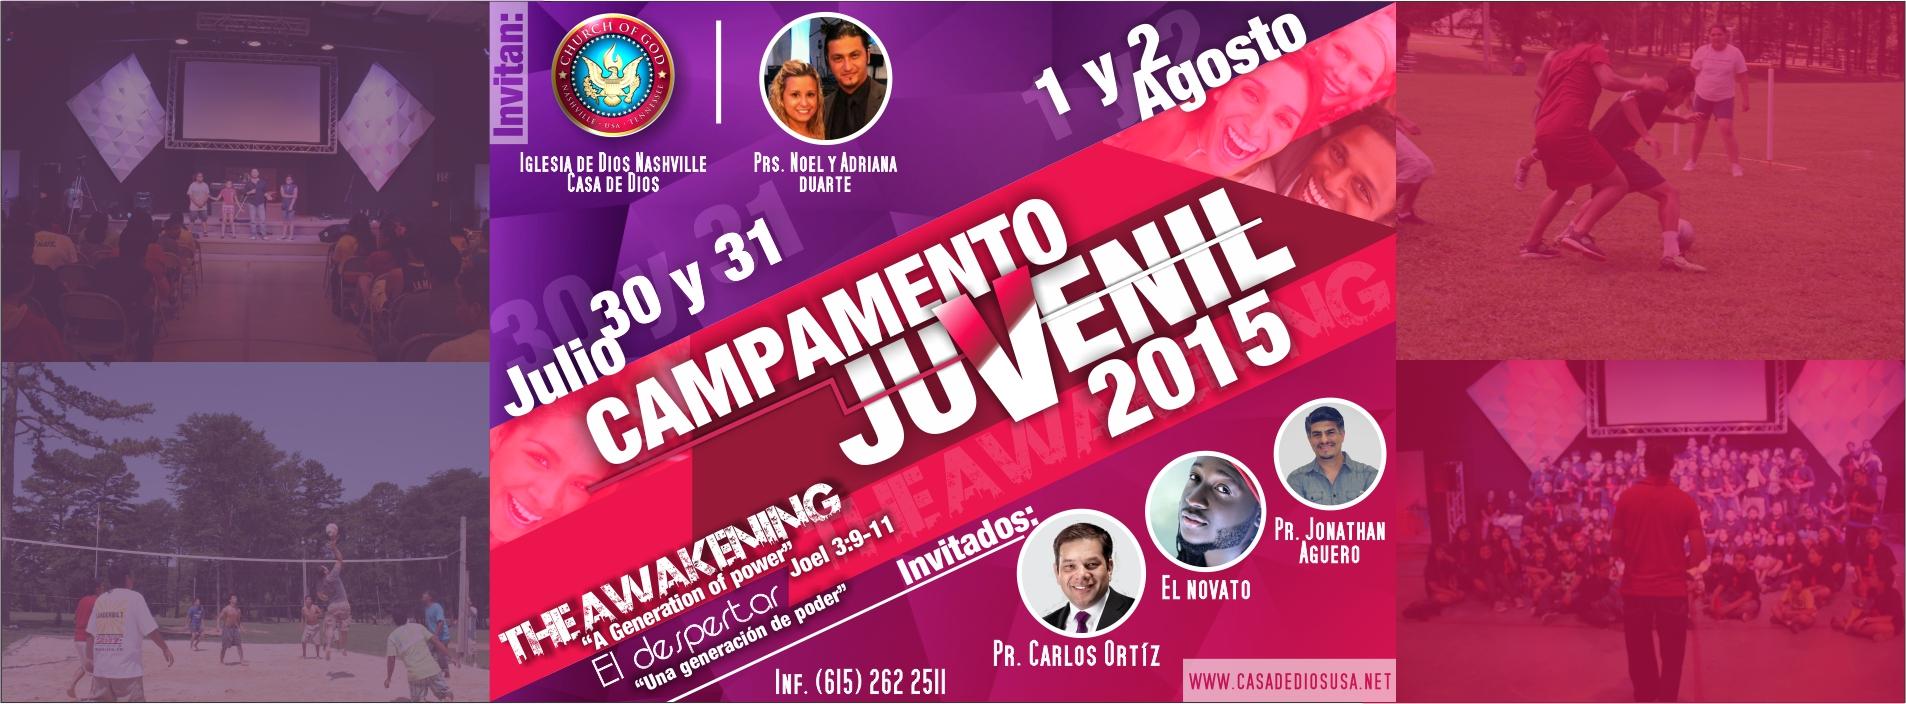 Campamento-Juvenil-2015-web